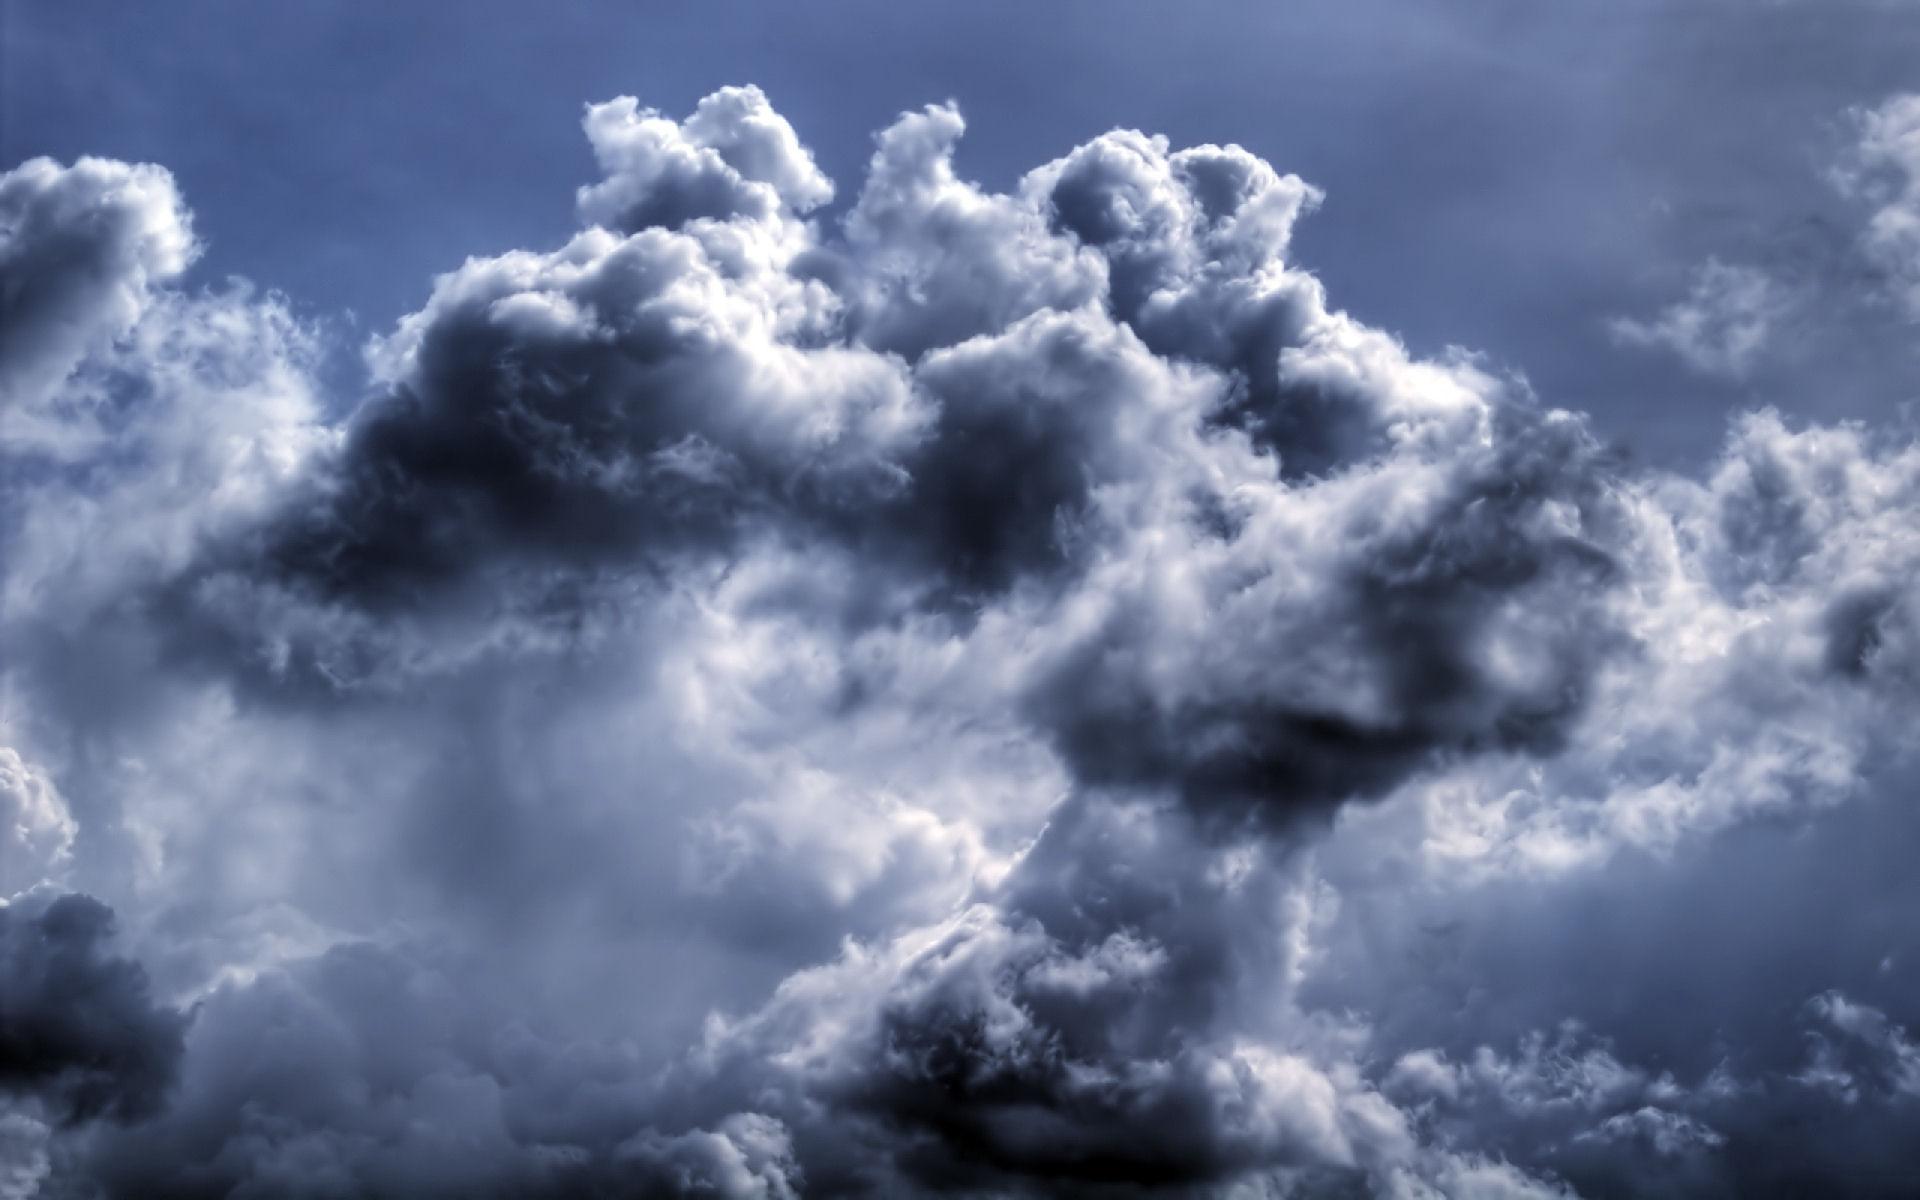 clouds silver images desctopwalls 1920x1200